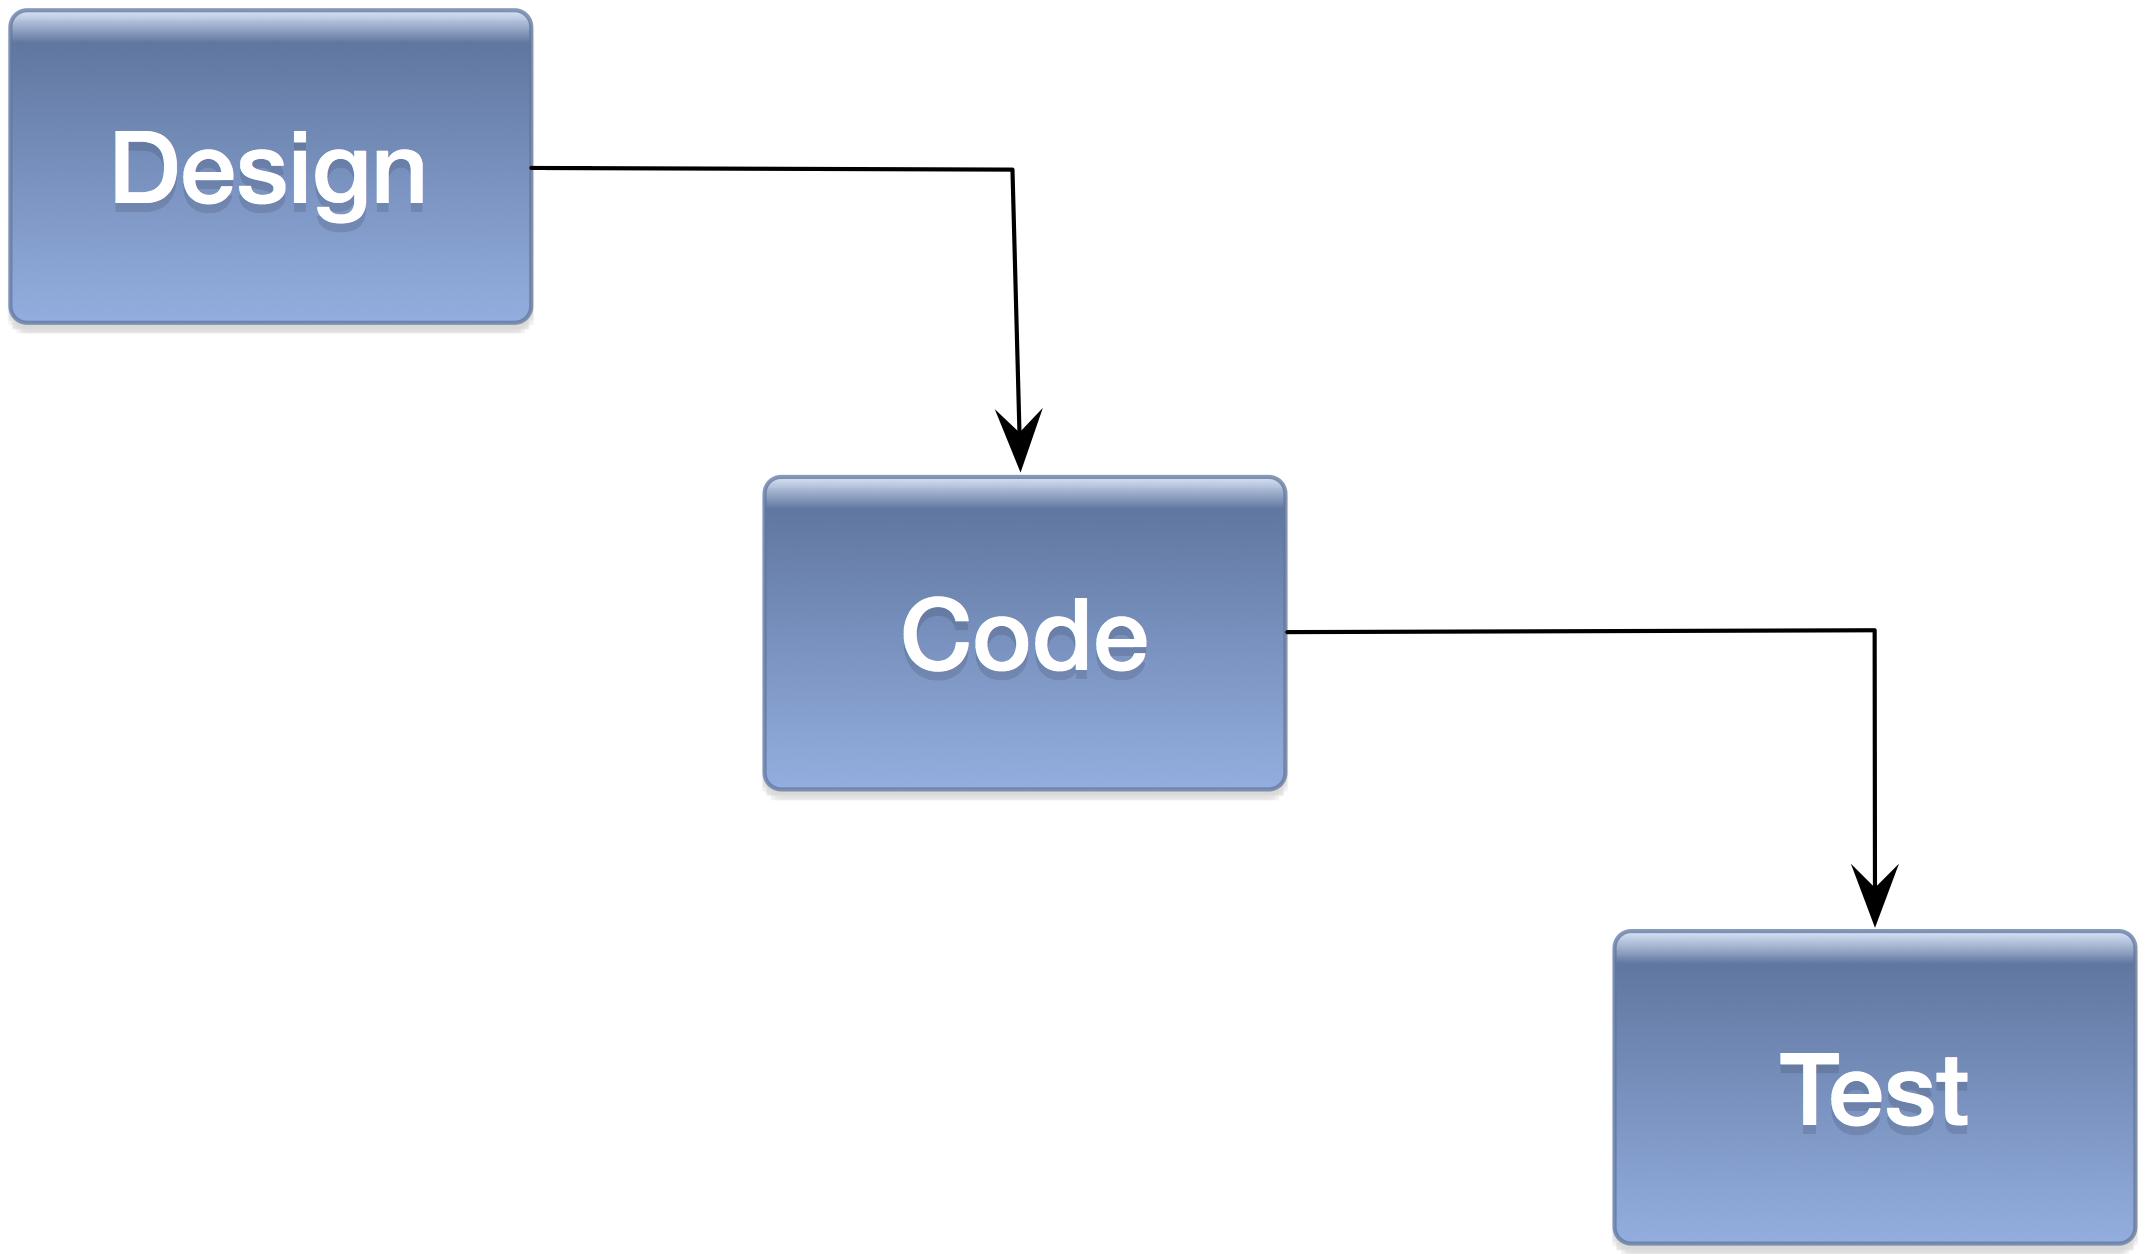 src/images/developpement-traditionnel.png